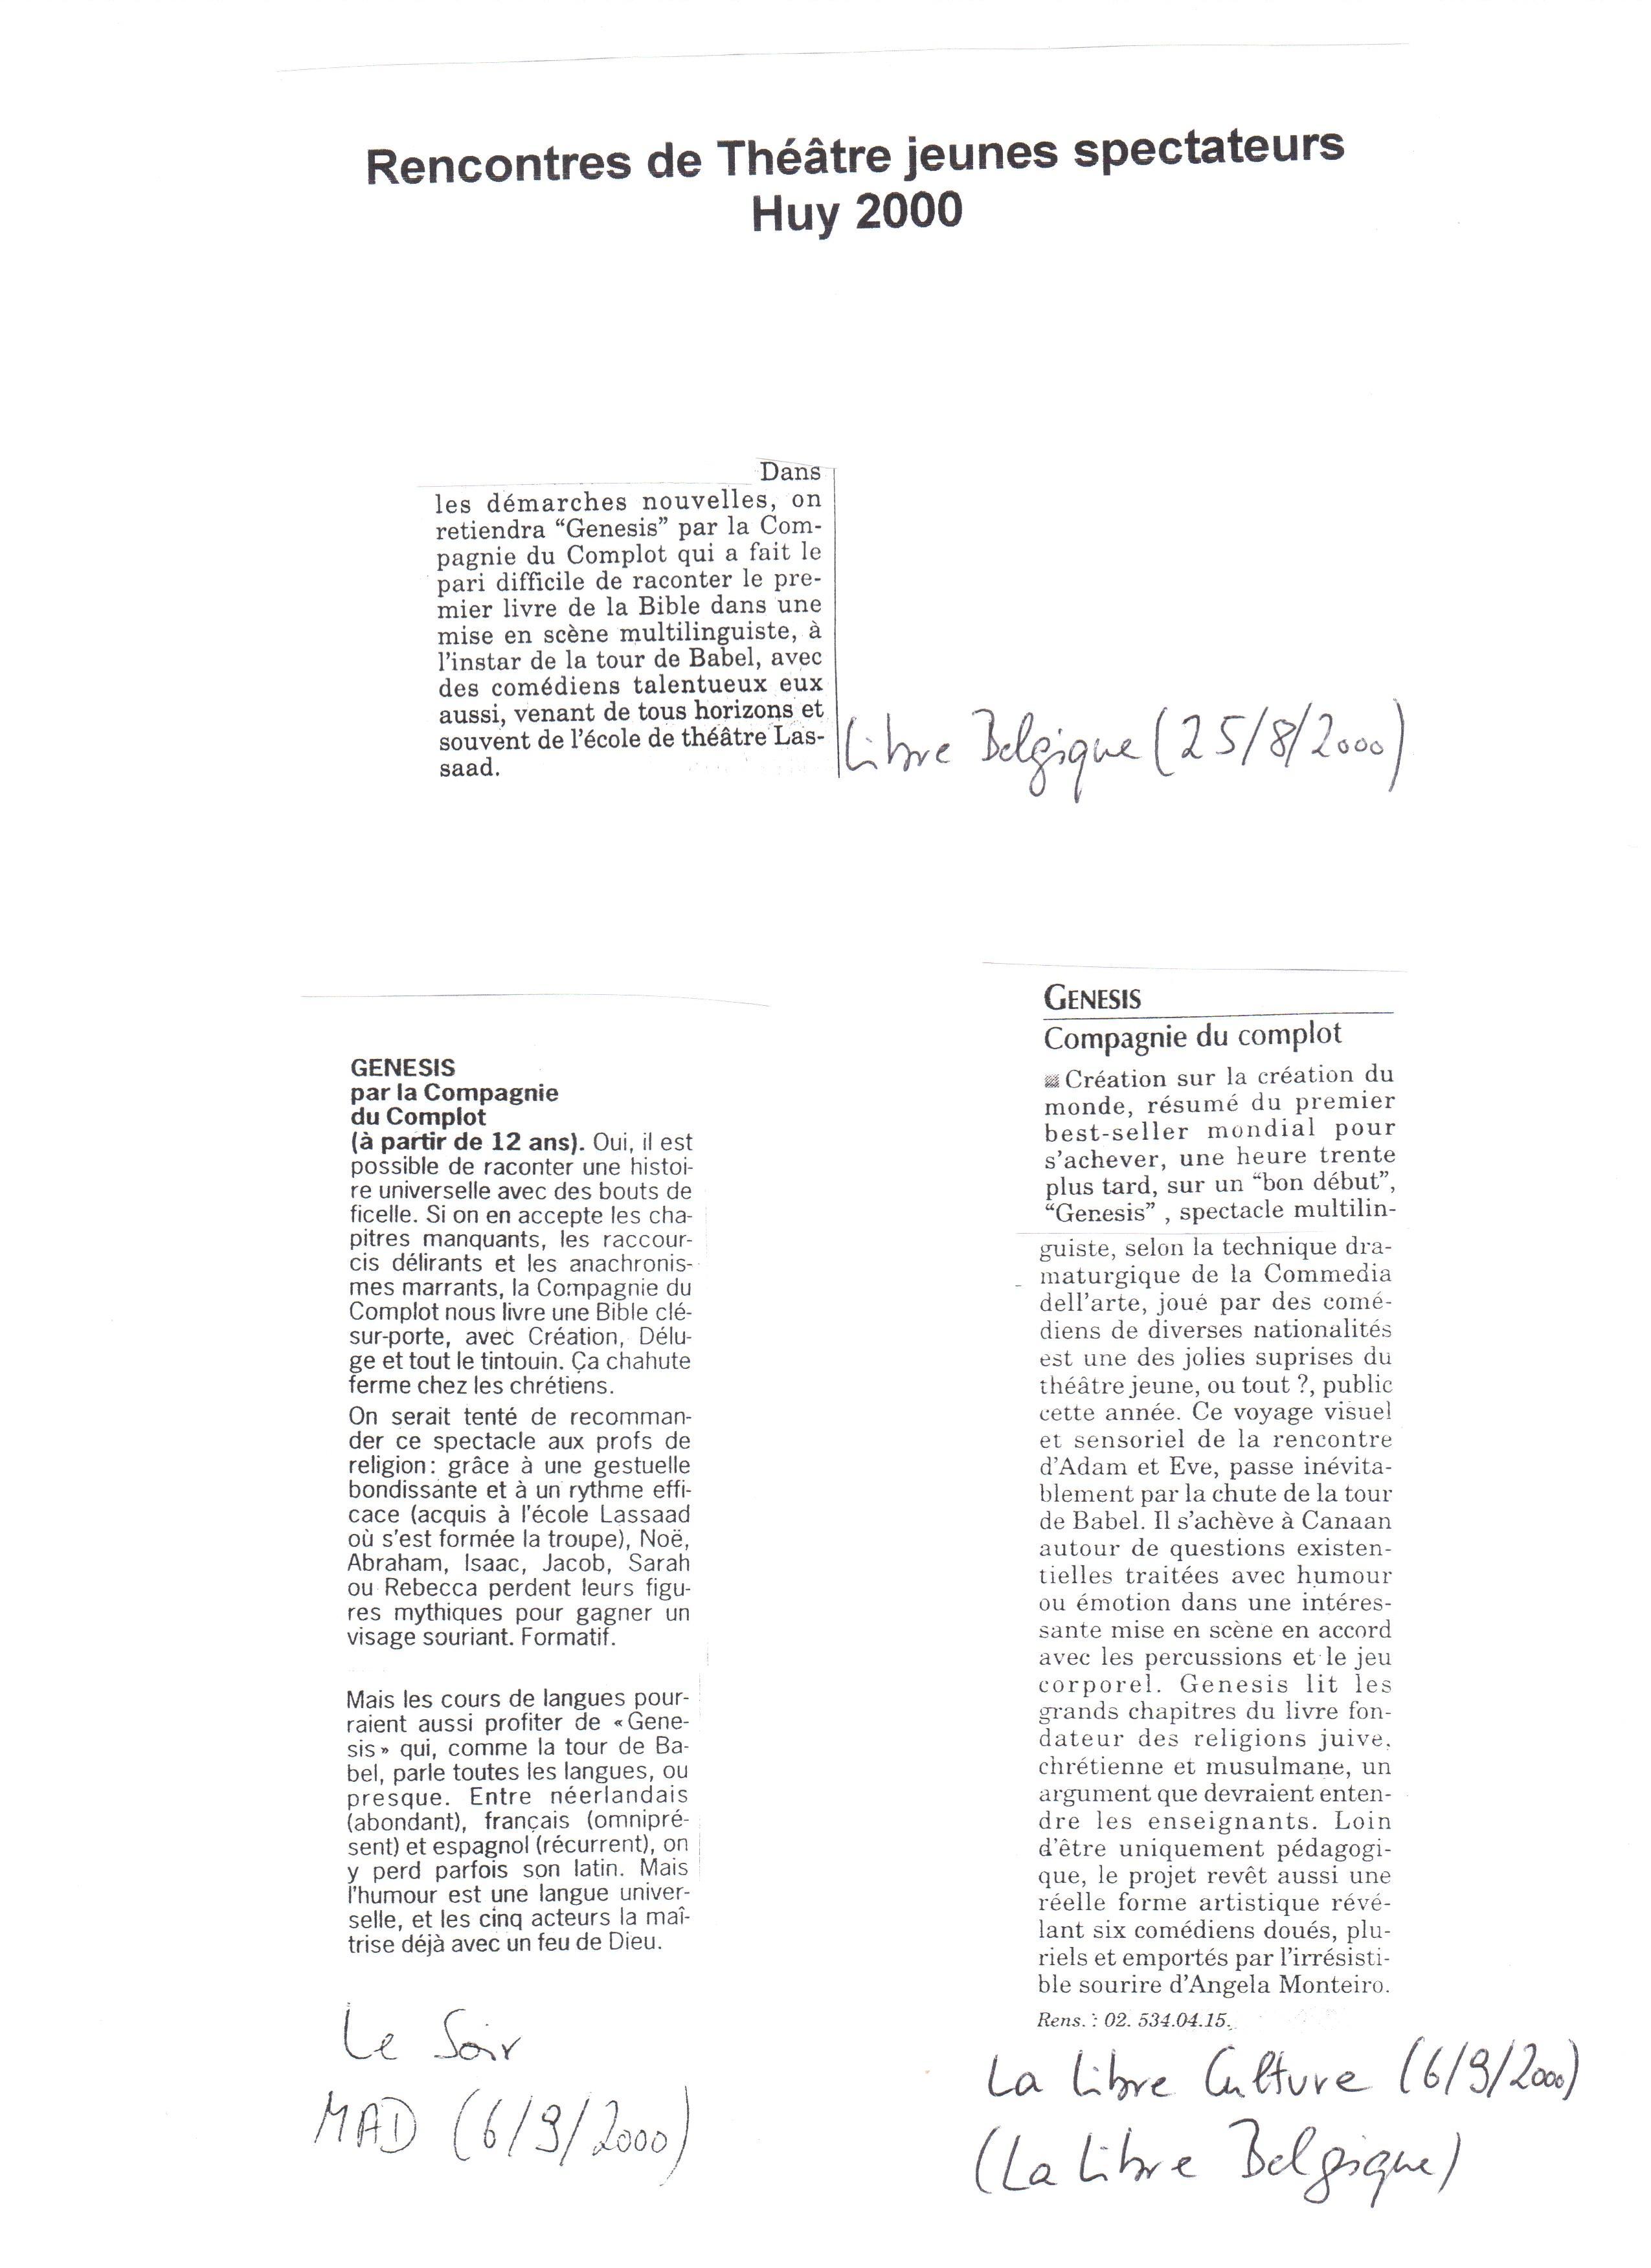 2) Libre Belgiue, Libre Culture, Le Soir (1)